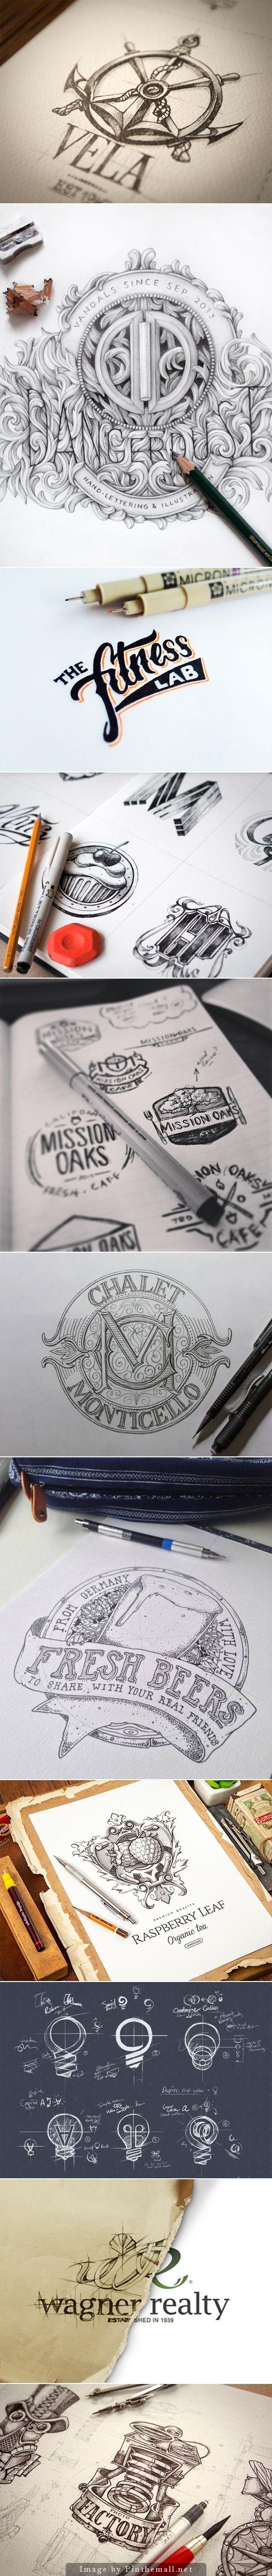 logo sketches #process